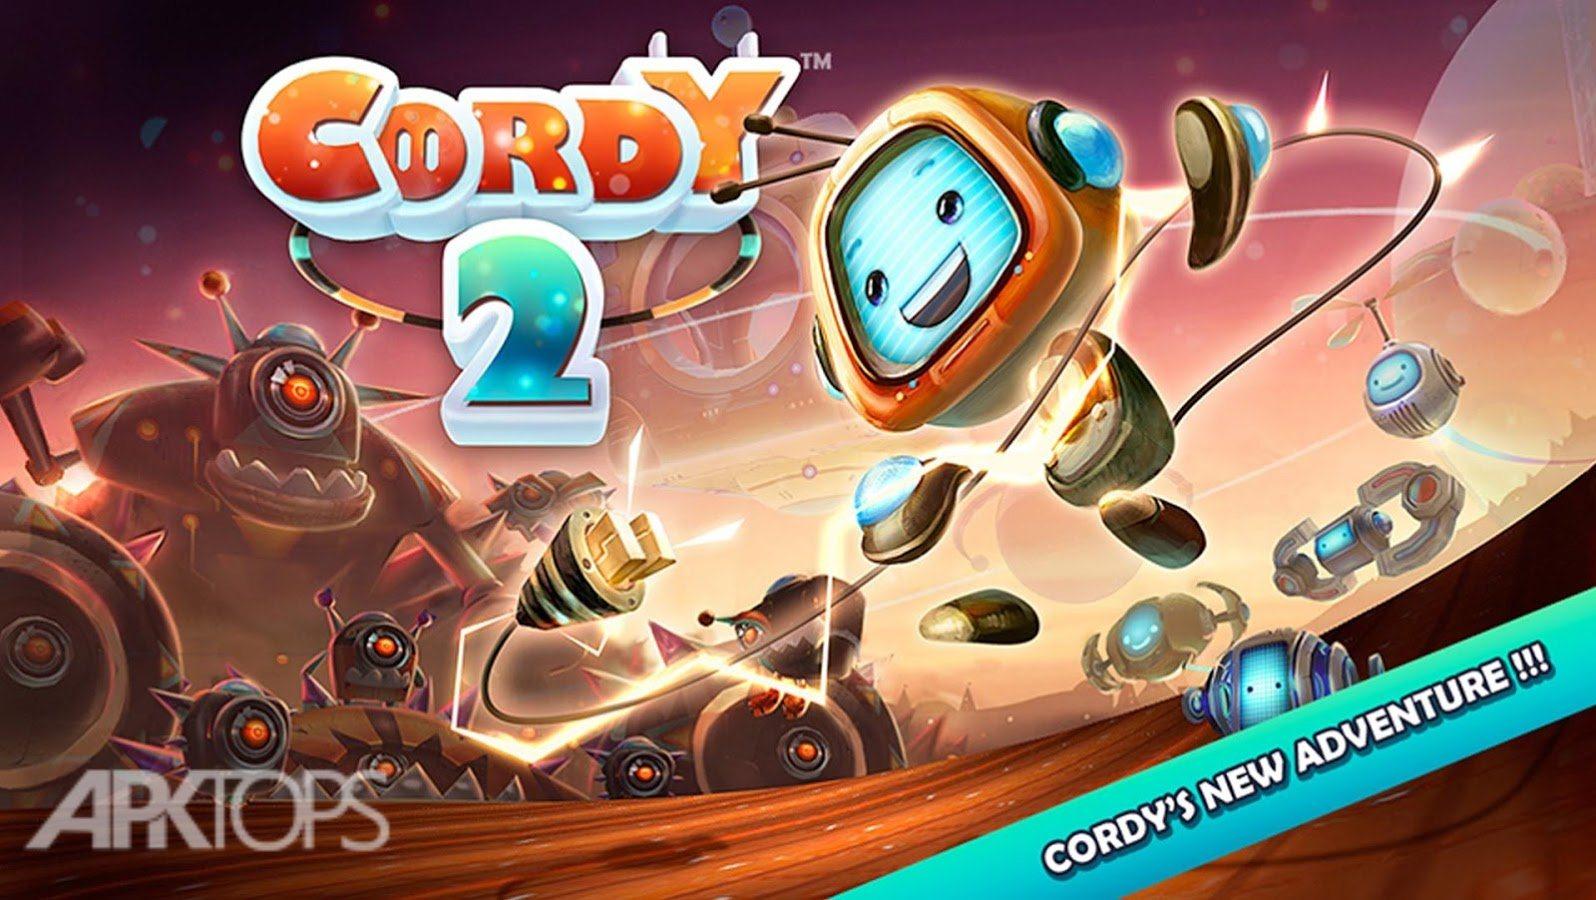 Cordy_2_cover[APKTOPS.ir]